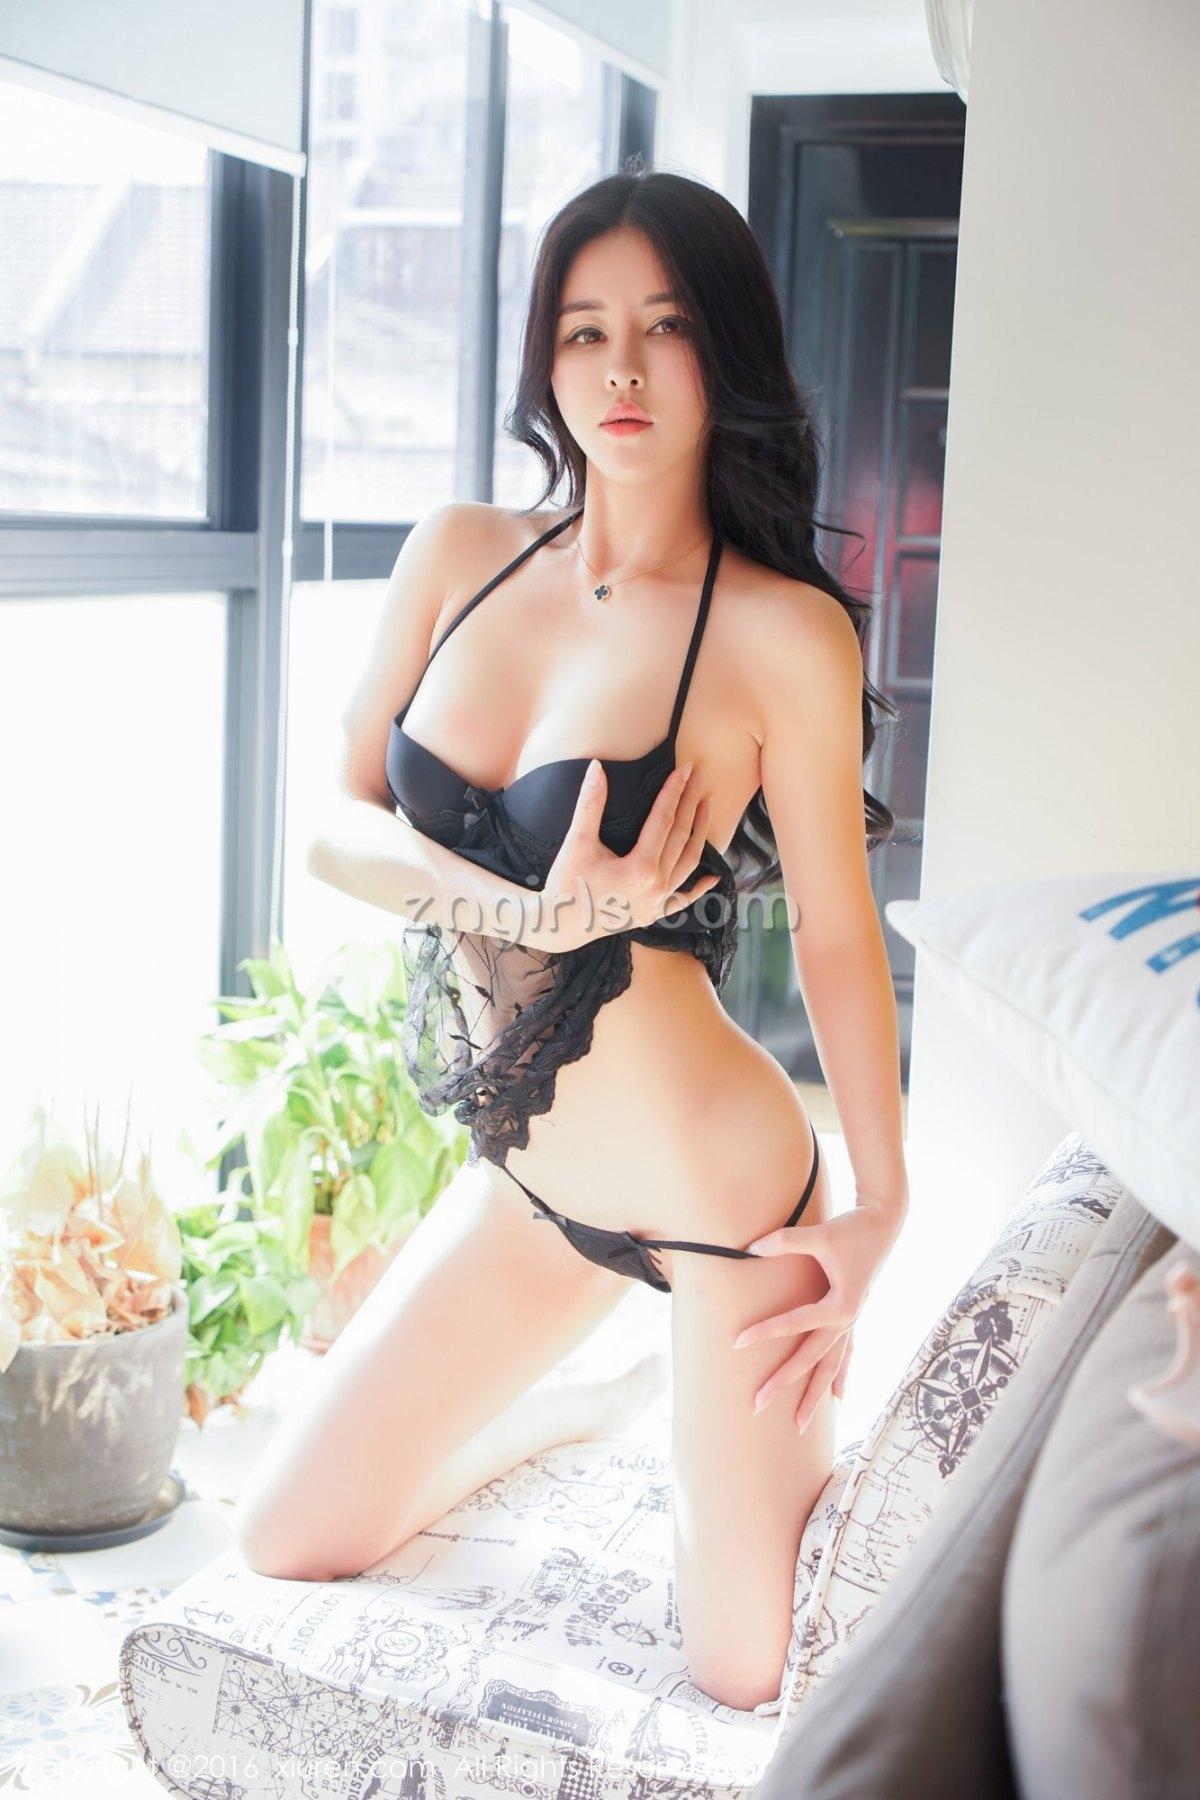 Sexy korean and japanese idols kpop amp jpop moaning - 1 part 6